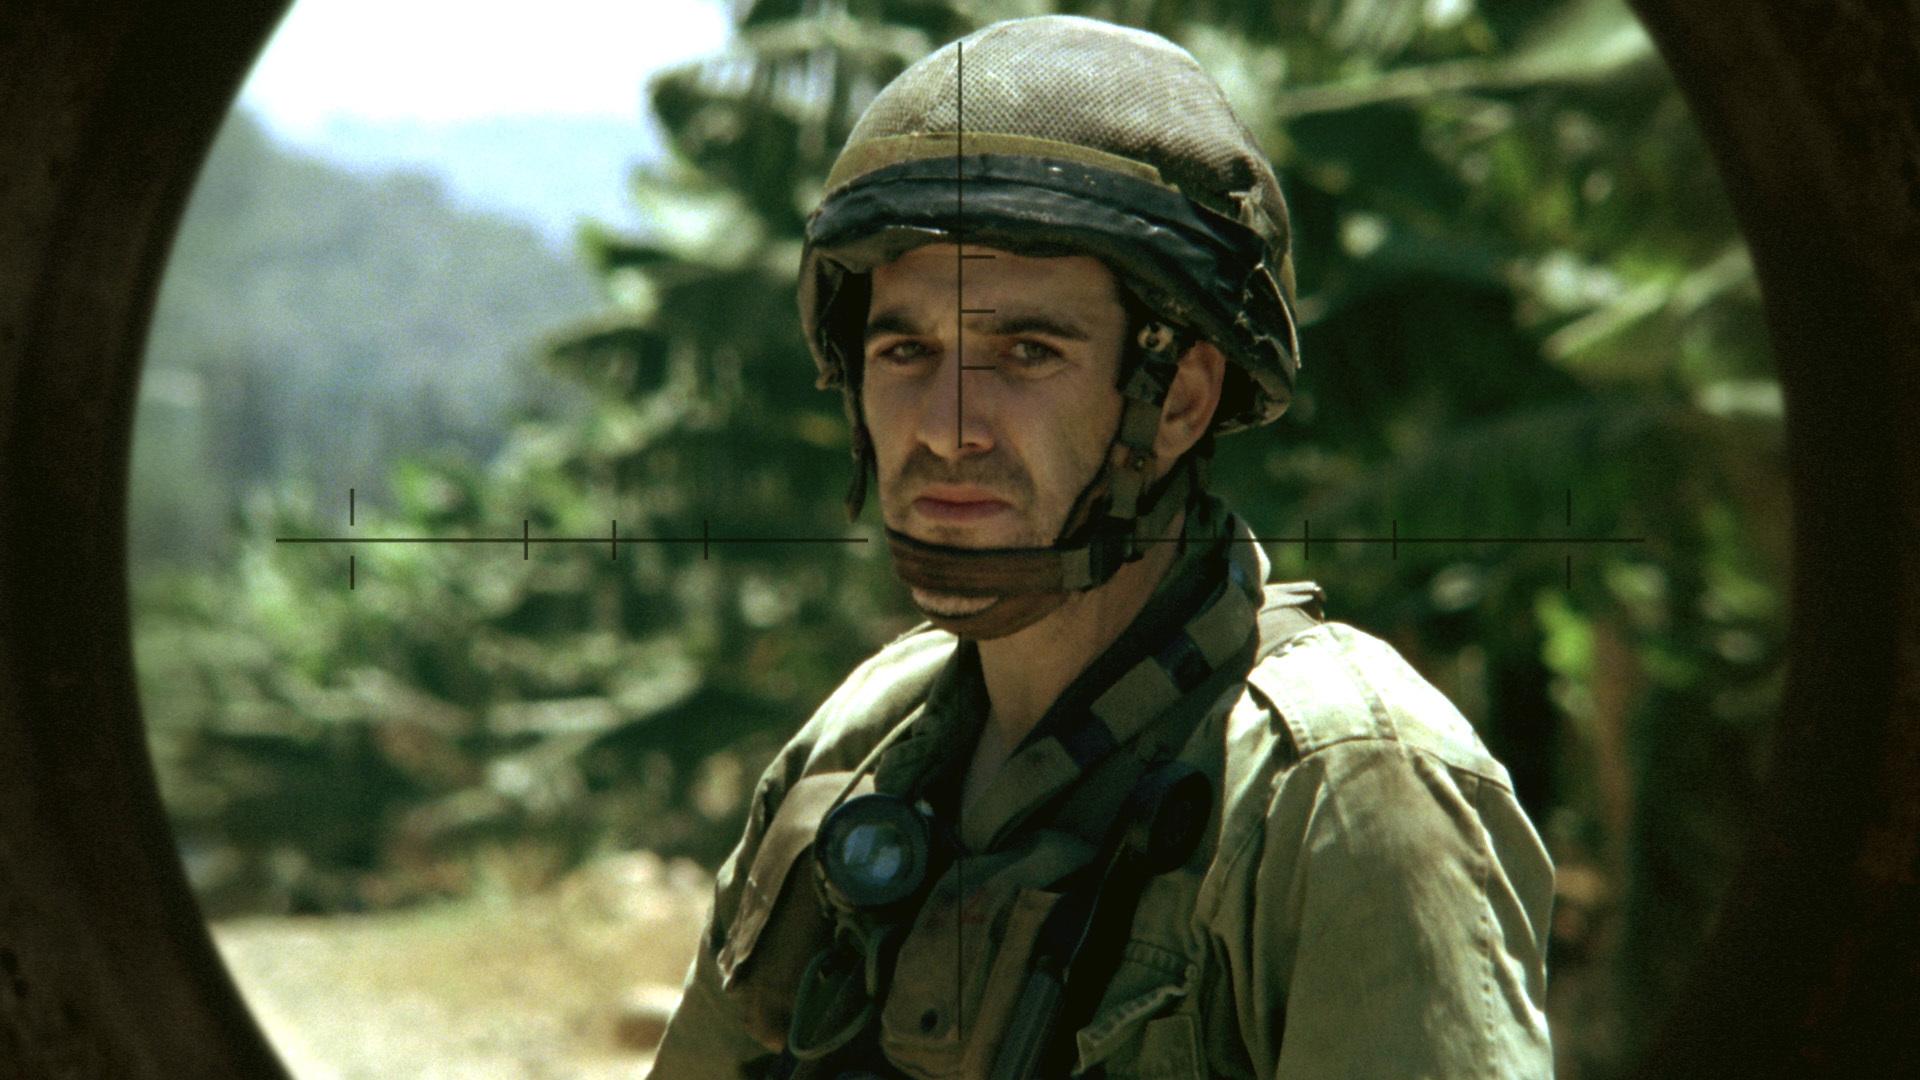 Still of Zohar Shtrauss in Lebanon (2009)